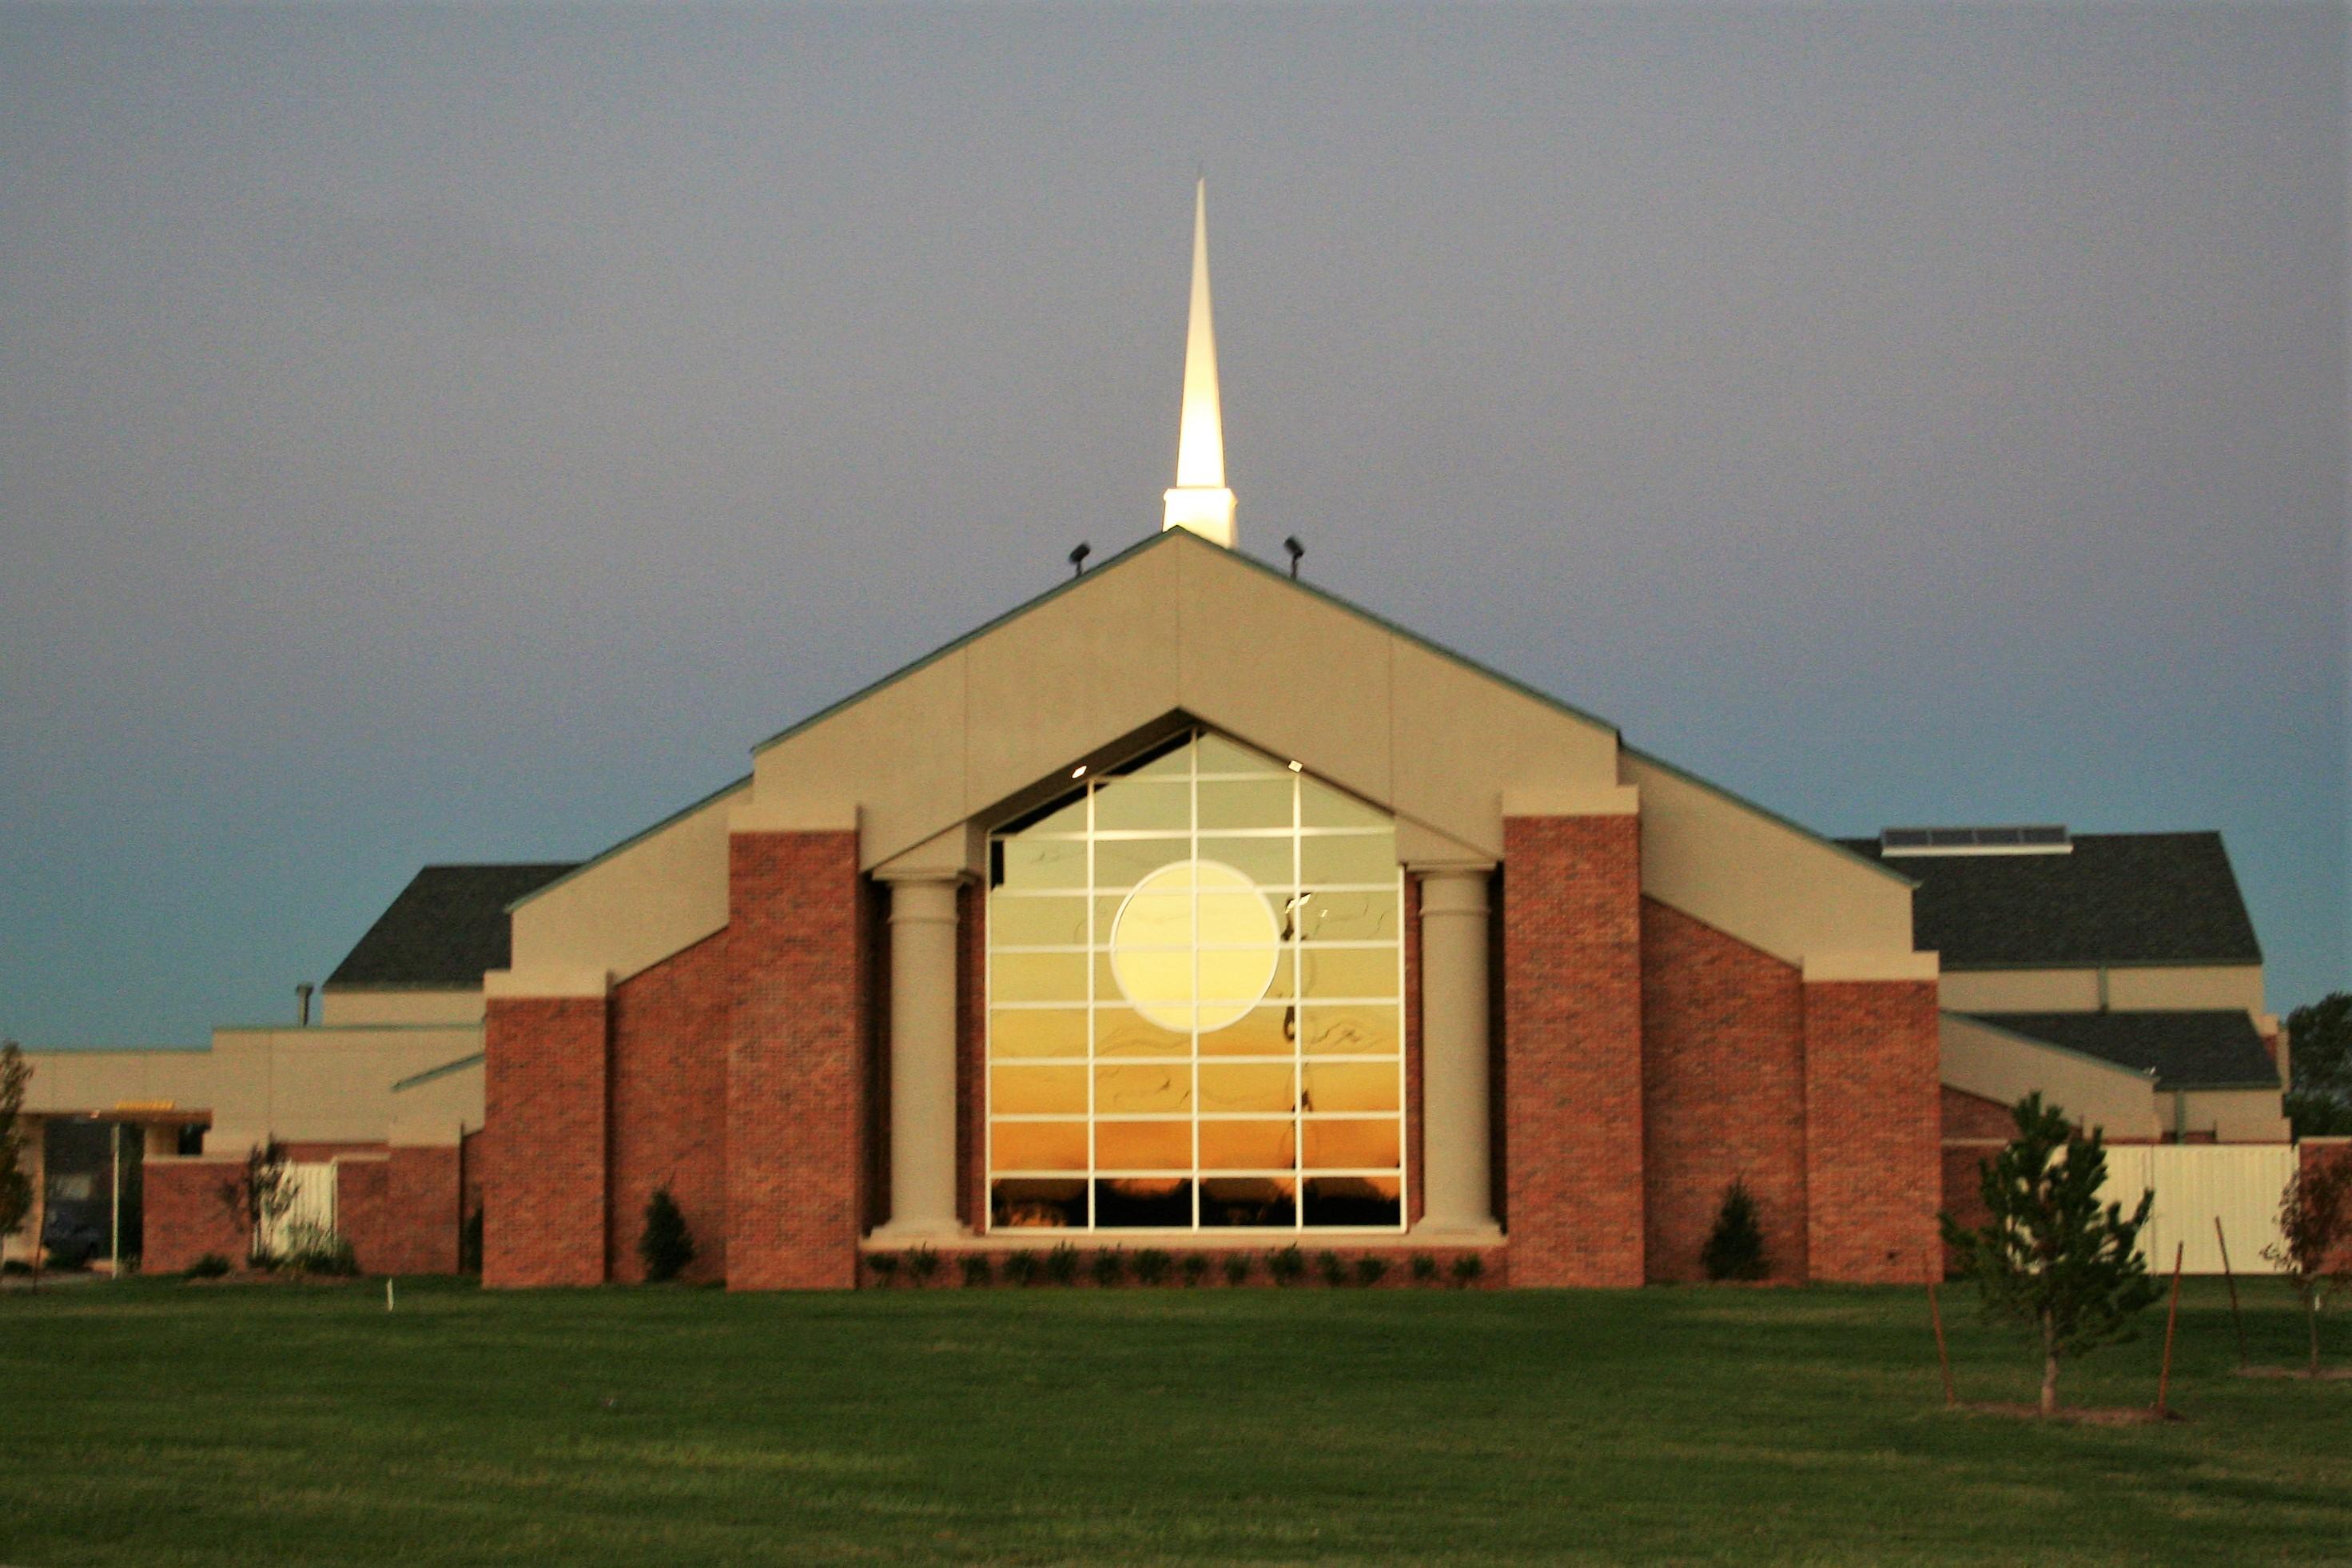 NorthHaven Church